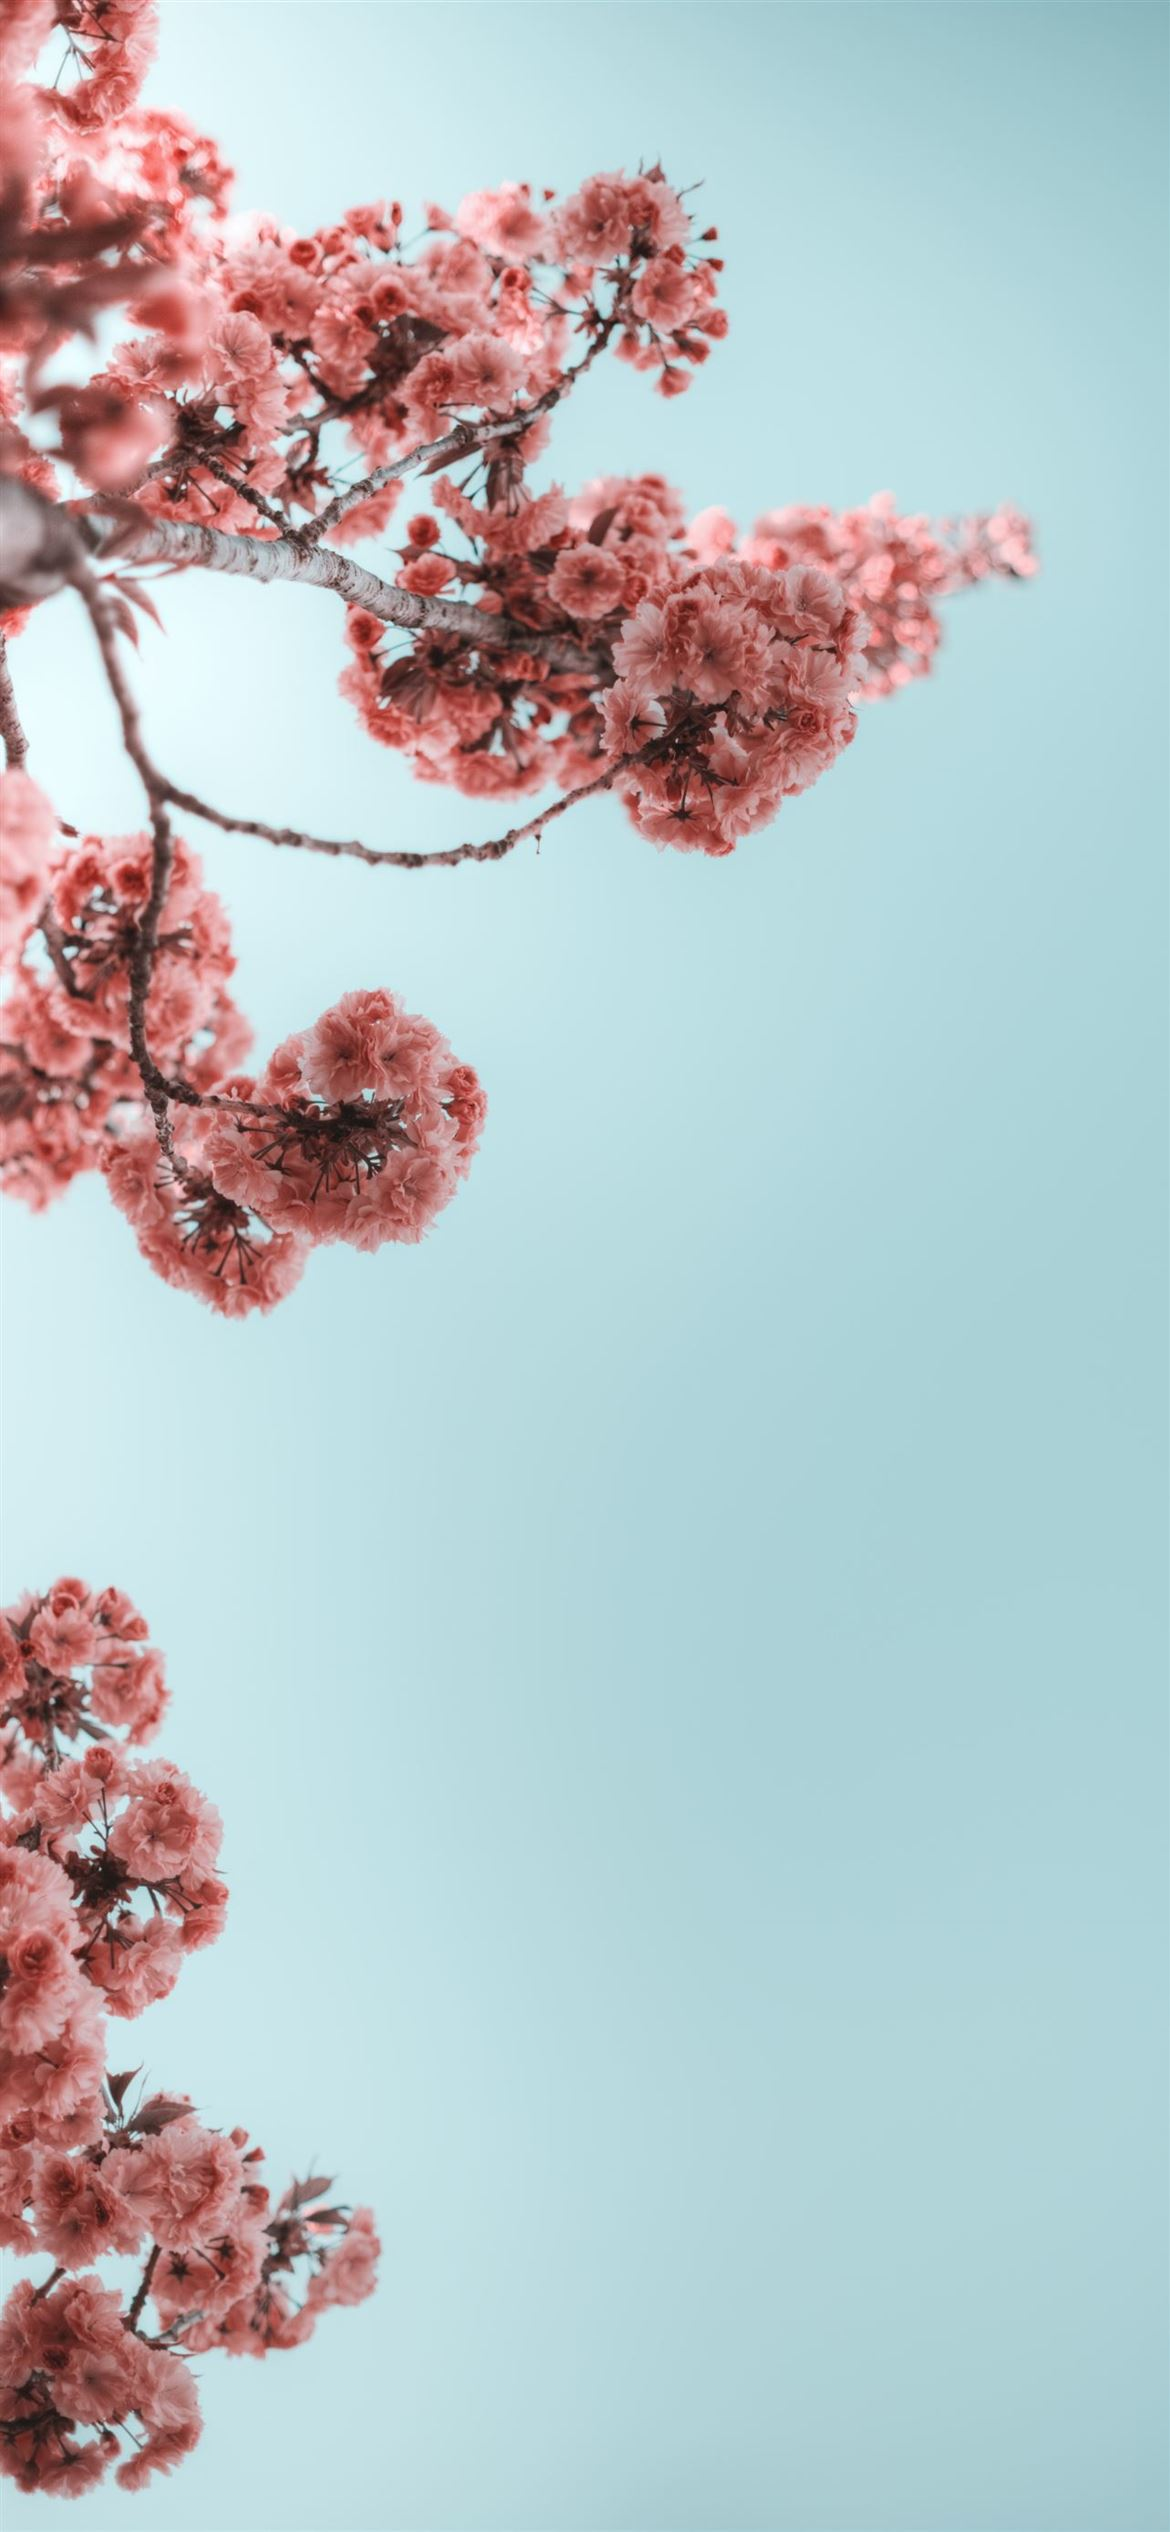 Best Flower iPhone 12 HD Wallpapers   iLikeWallpaper